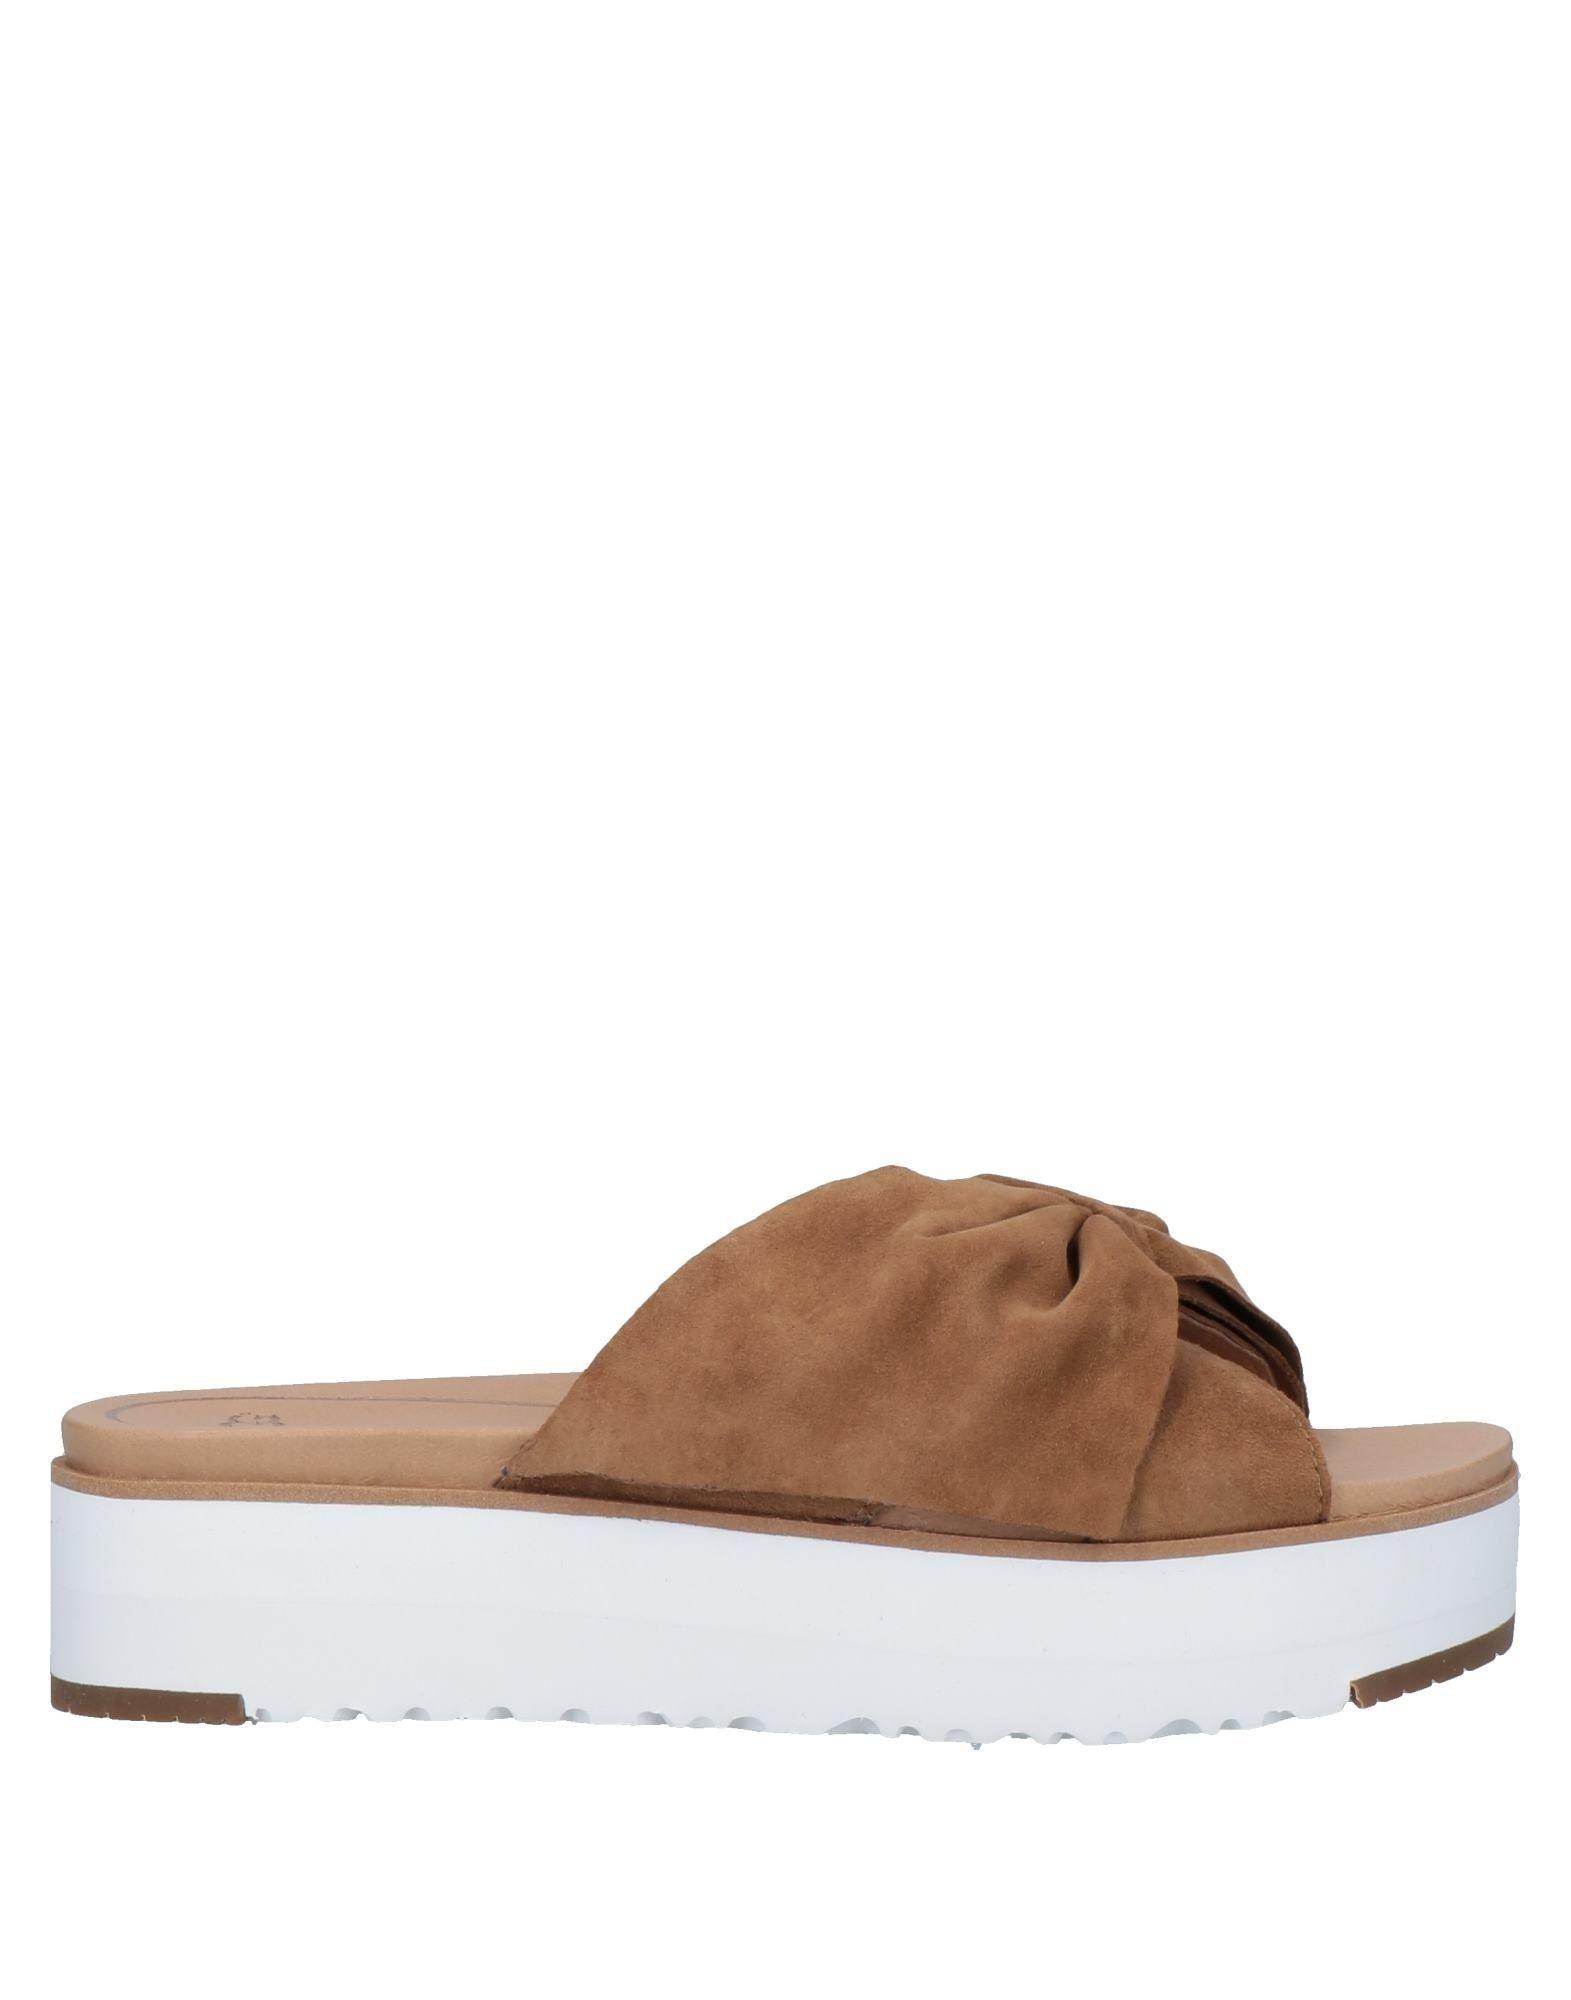 UGG AUSTRALIA Сандалии ugg classic short pink $123 00 ugg boots outlet online uggbootsonsale co